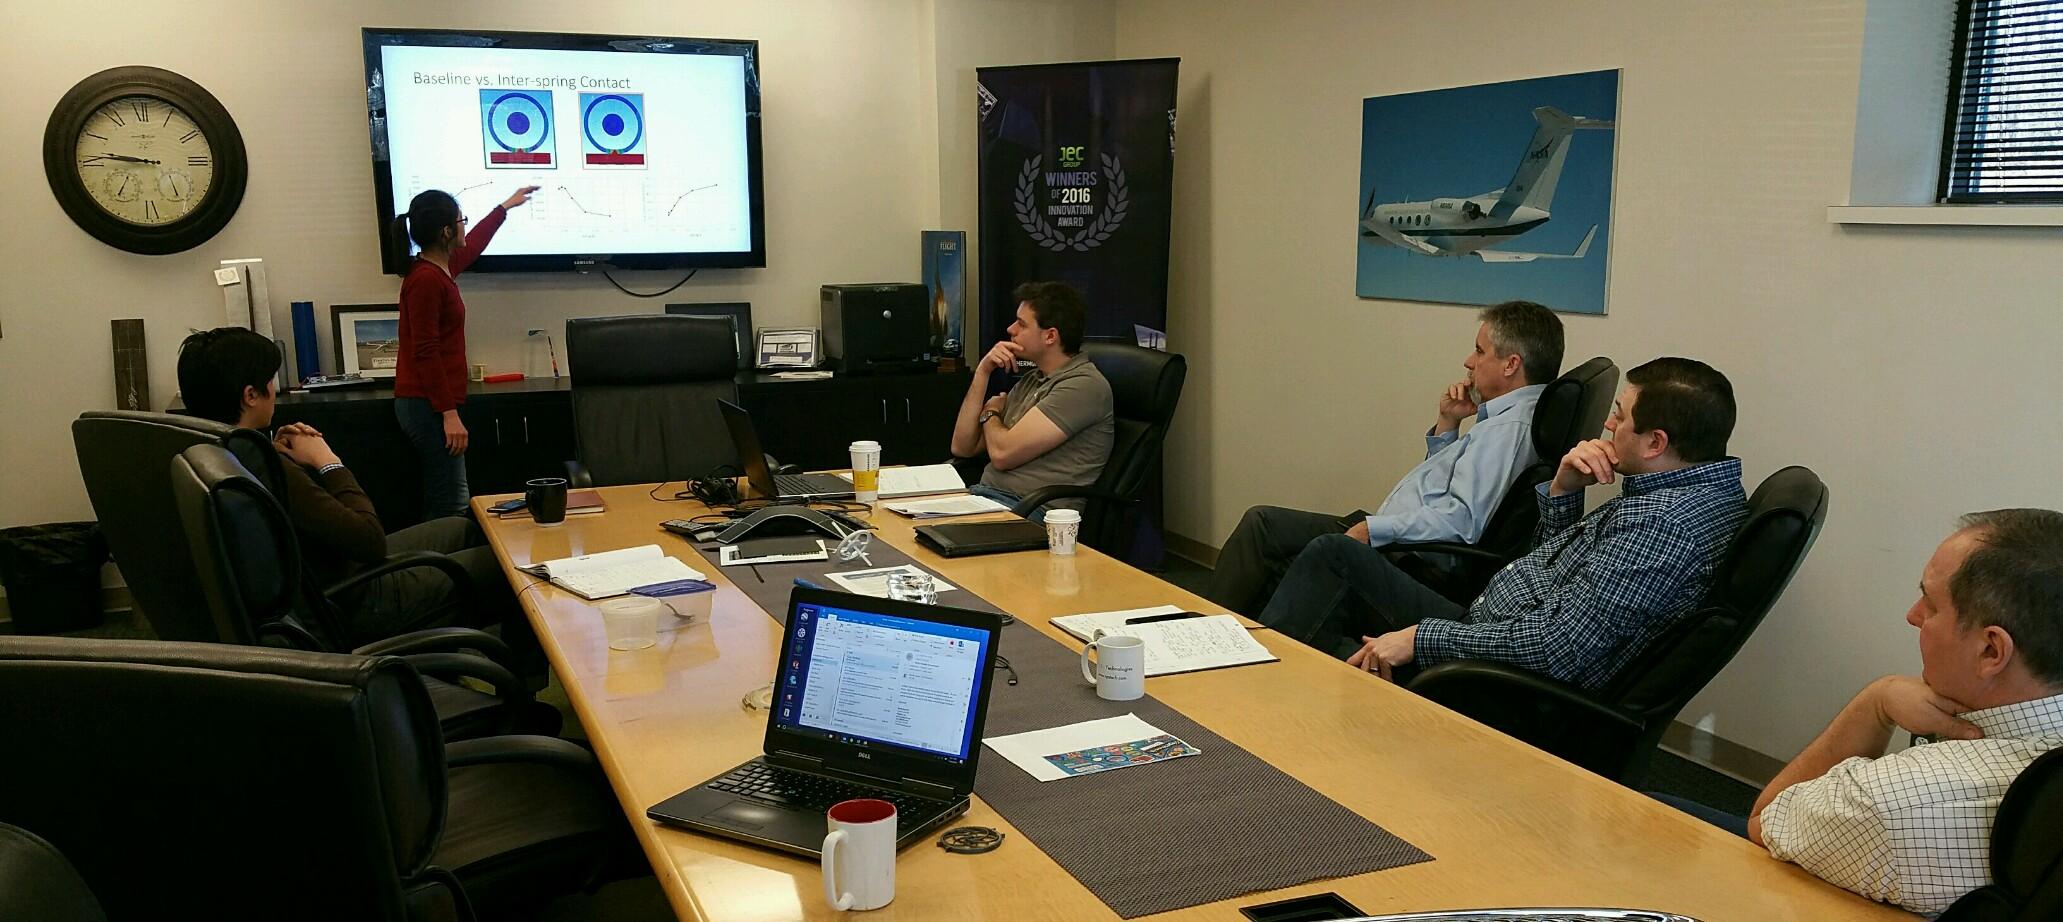 An actual brainstorm session at FlexSys.